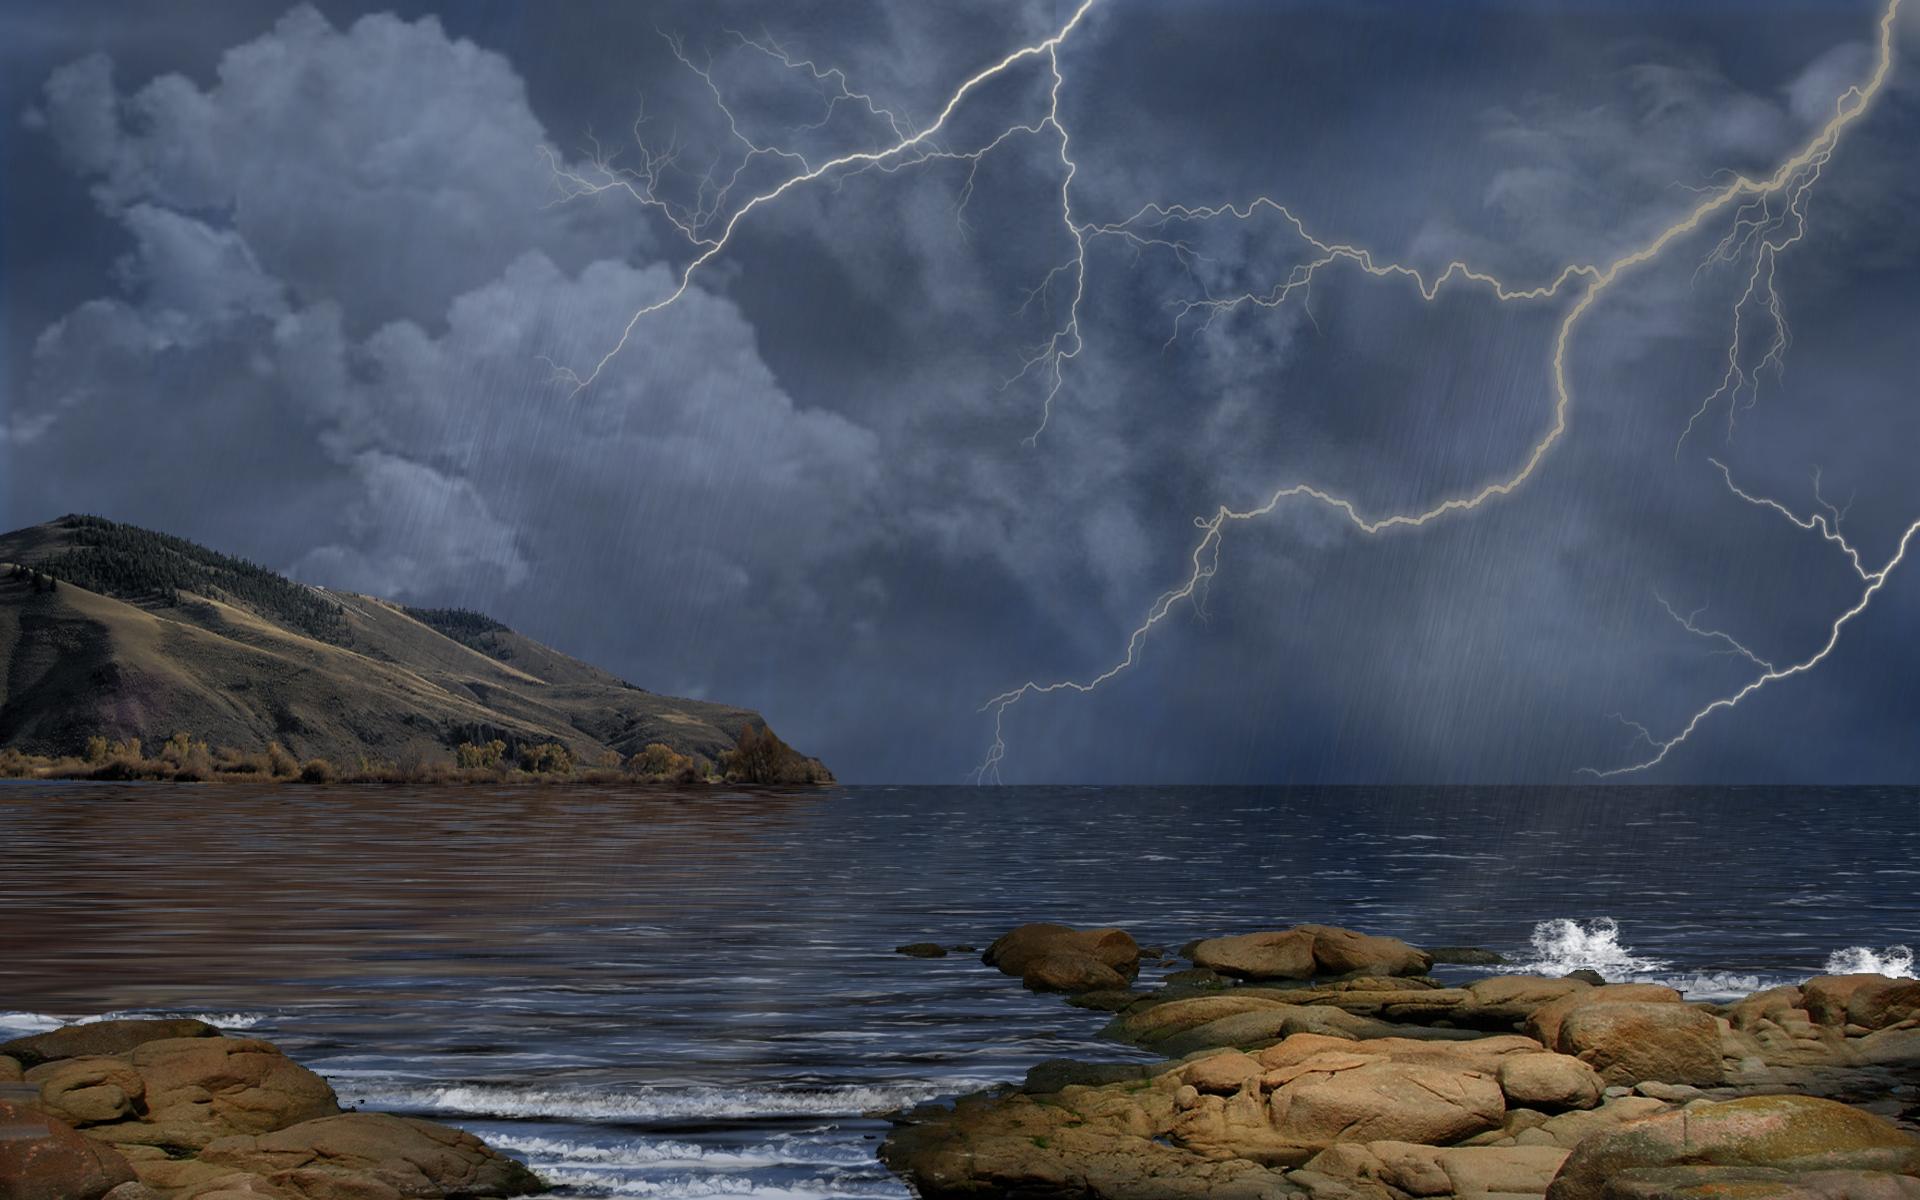 Lightning thunderstorm Landscape Wallpaper Desktop Background 1920x1200